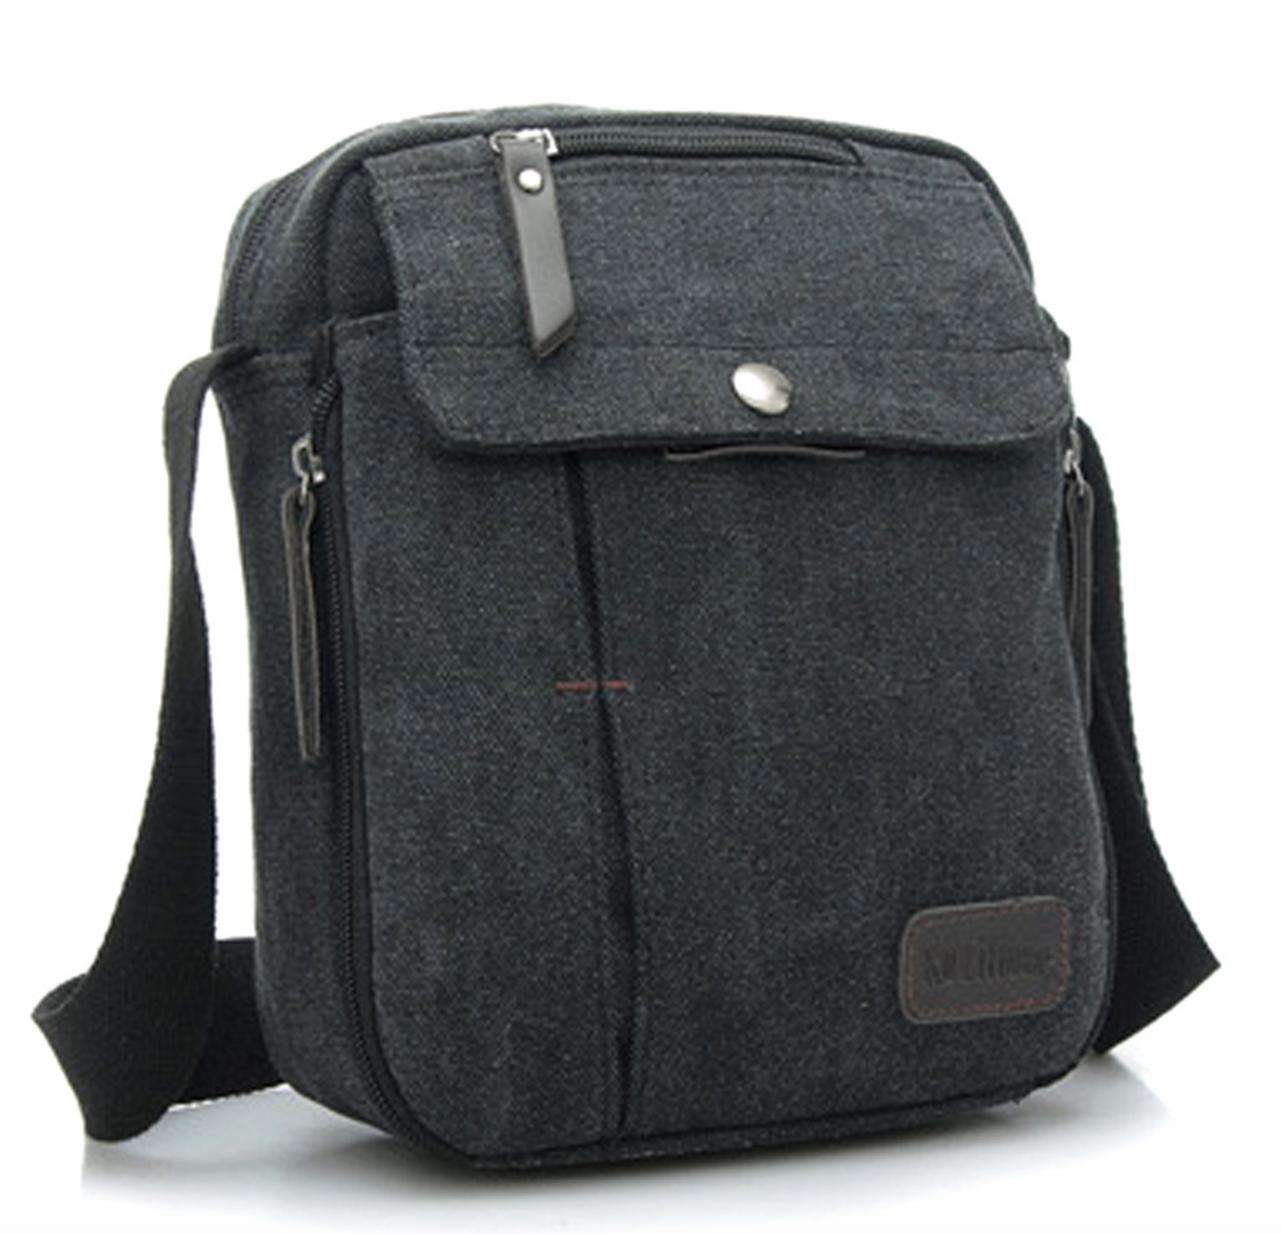 9c2f3aa064 Black Vintage Canvas Travel Satchel Bag Beautiful Stylish Shoulder ...